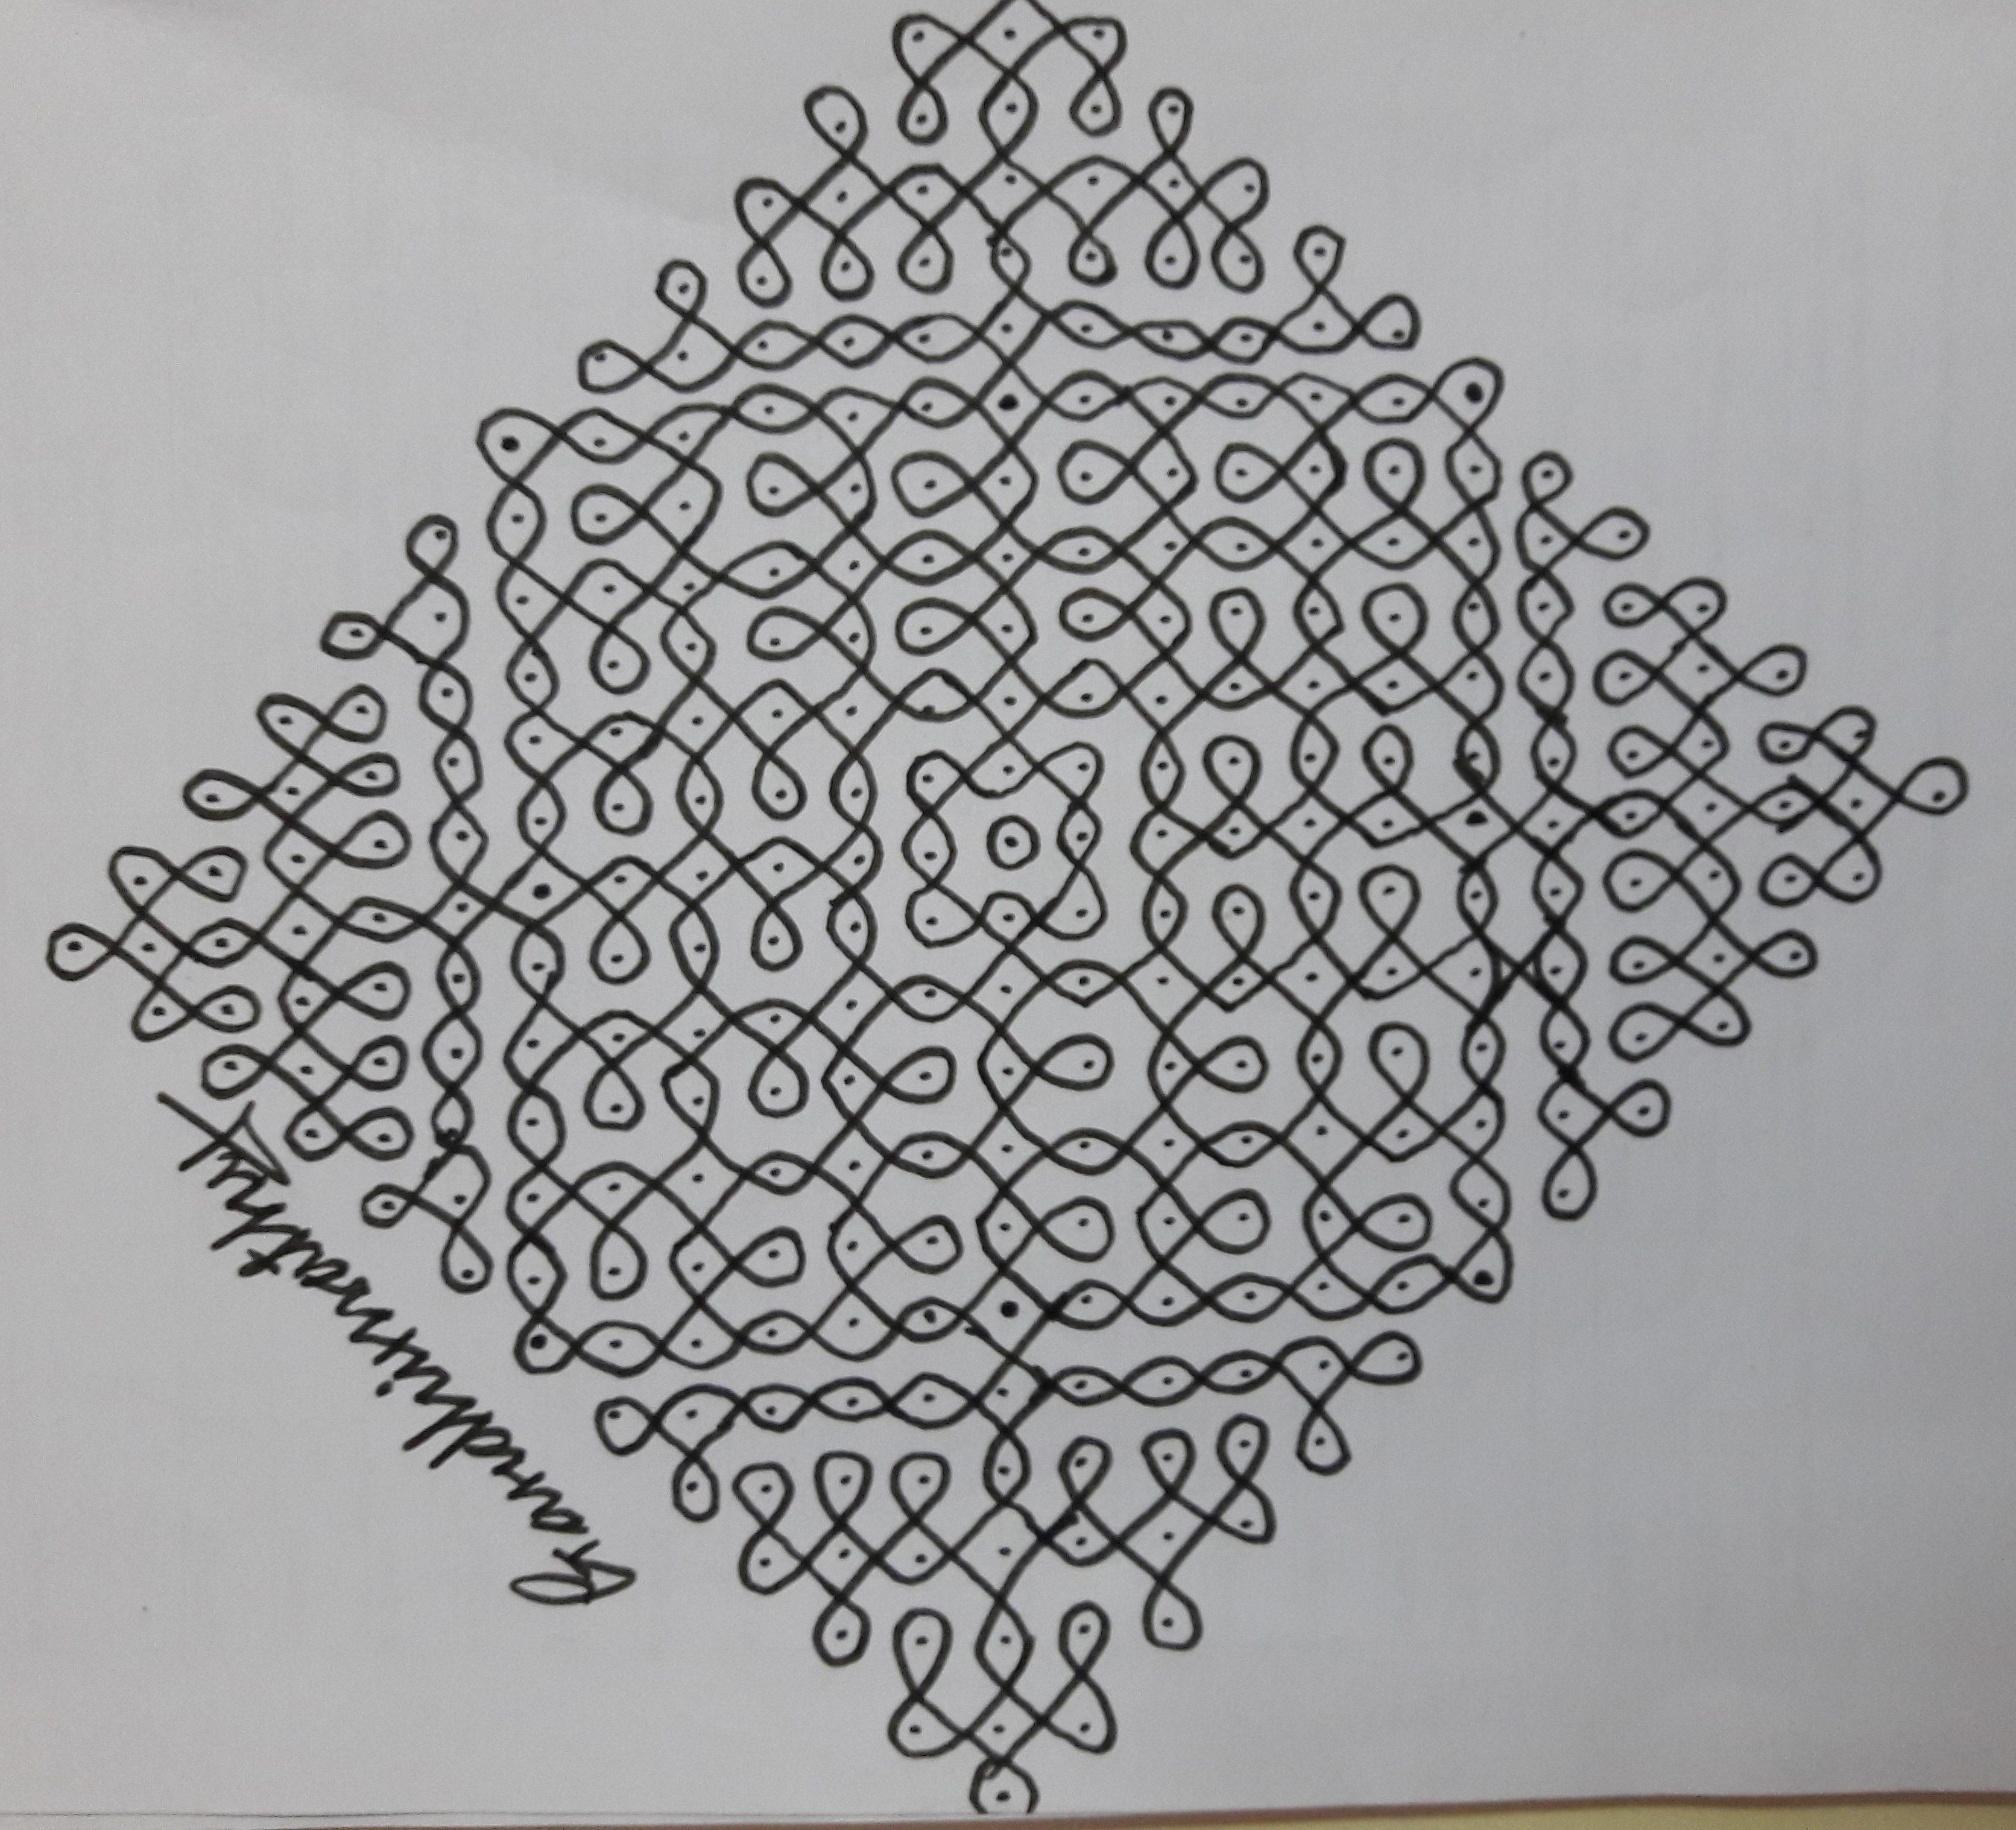 25 dots Sikku Kolam for Contest kolam 17